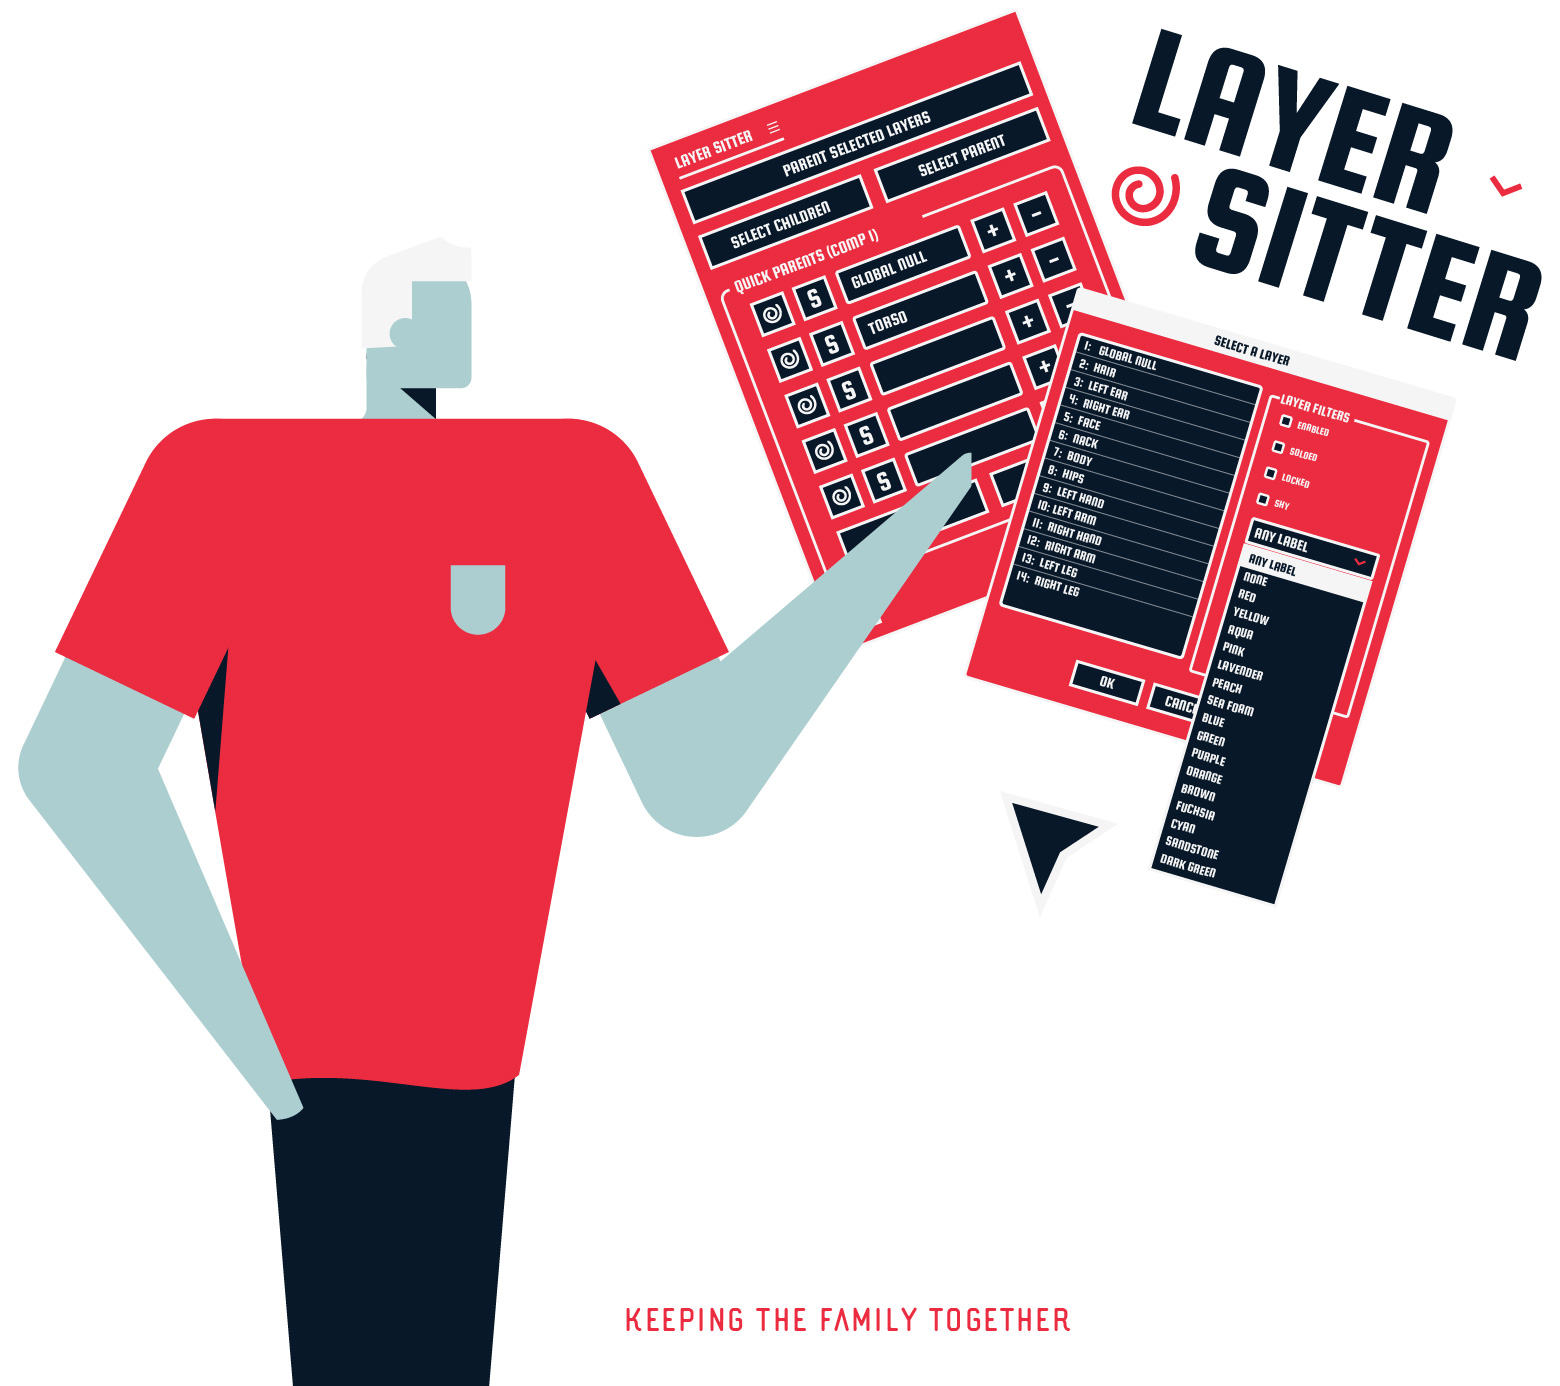 LayerSitter_Installation-04